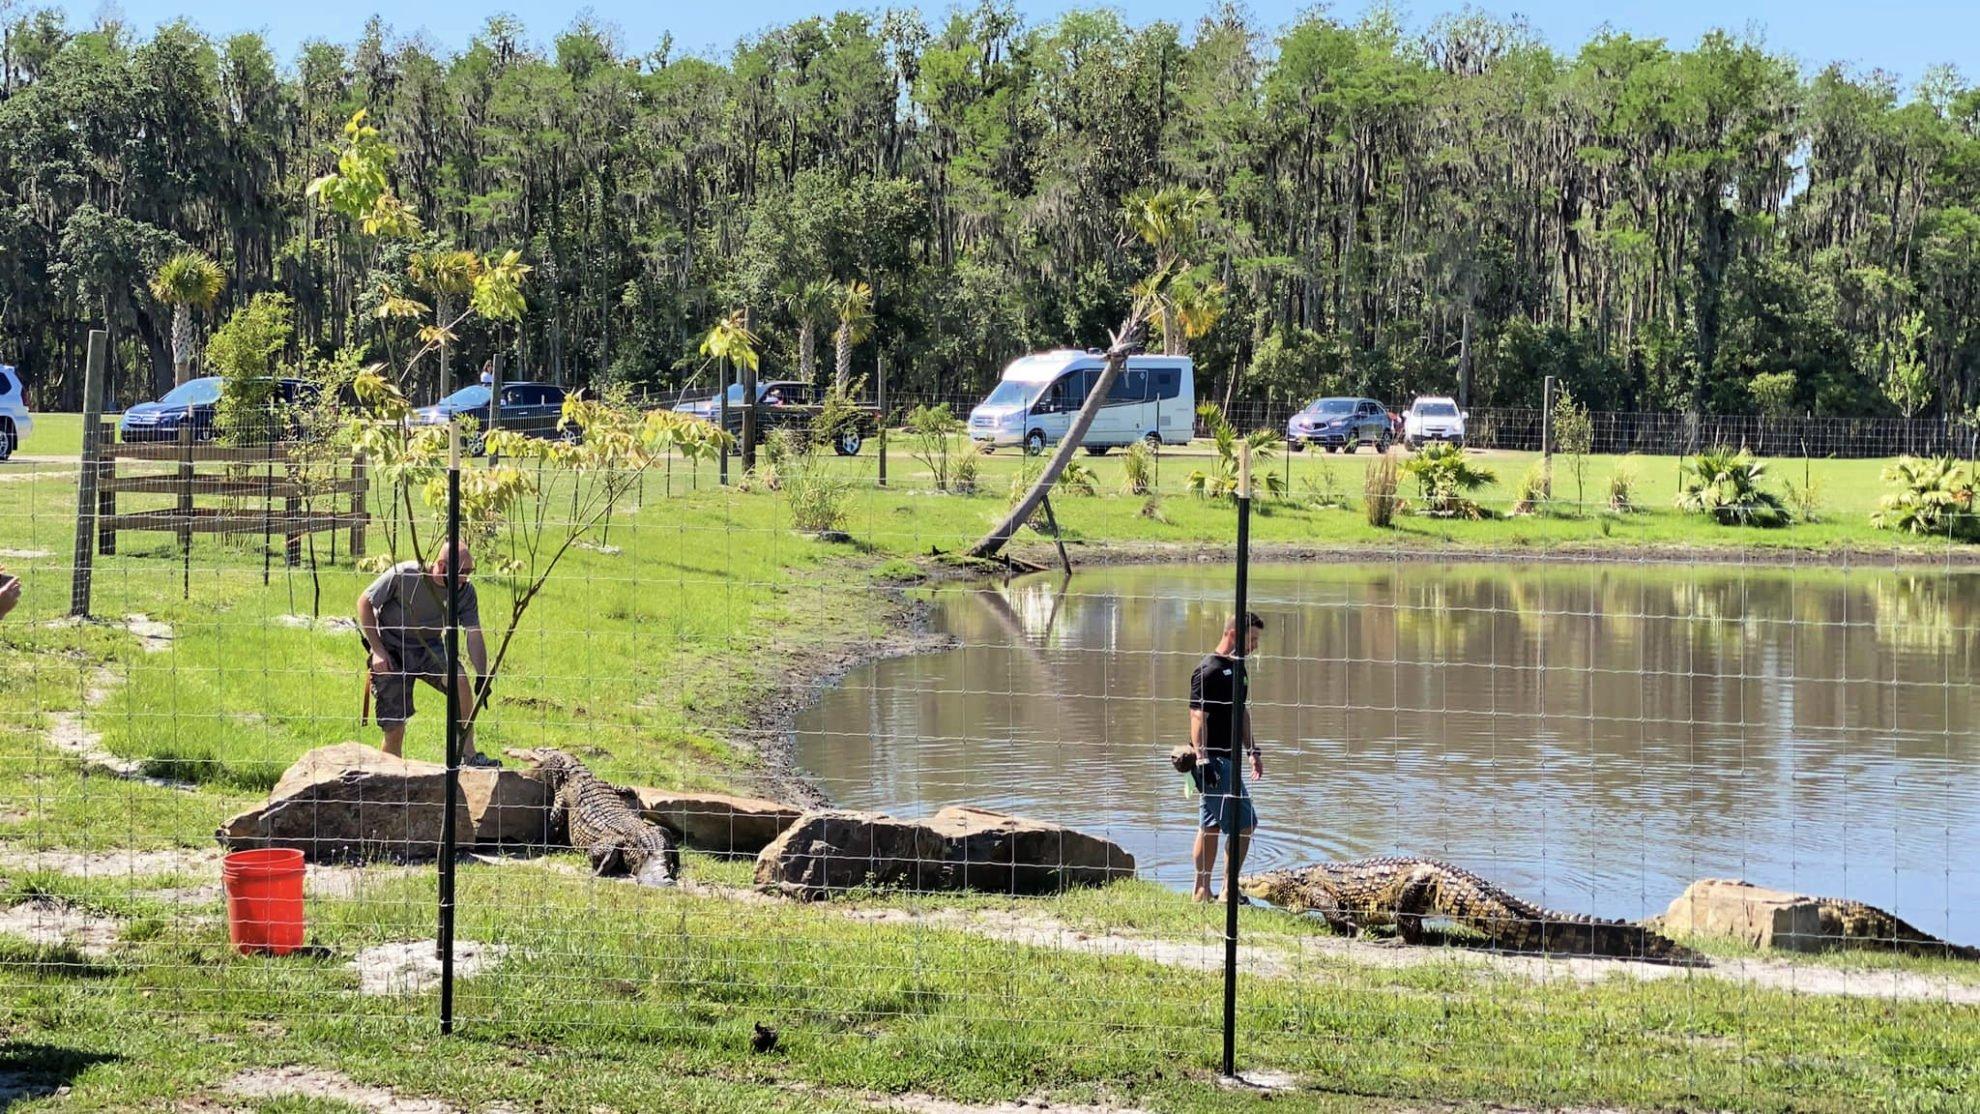 feeding crocodiles at Wild Florida Drive-Thru Safari Park